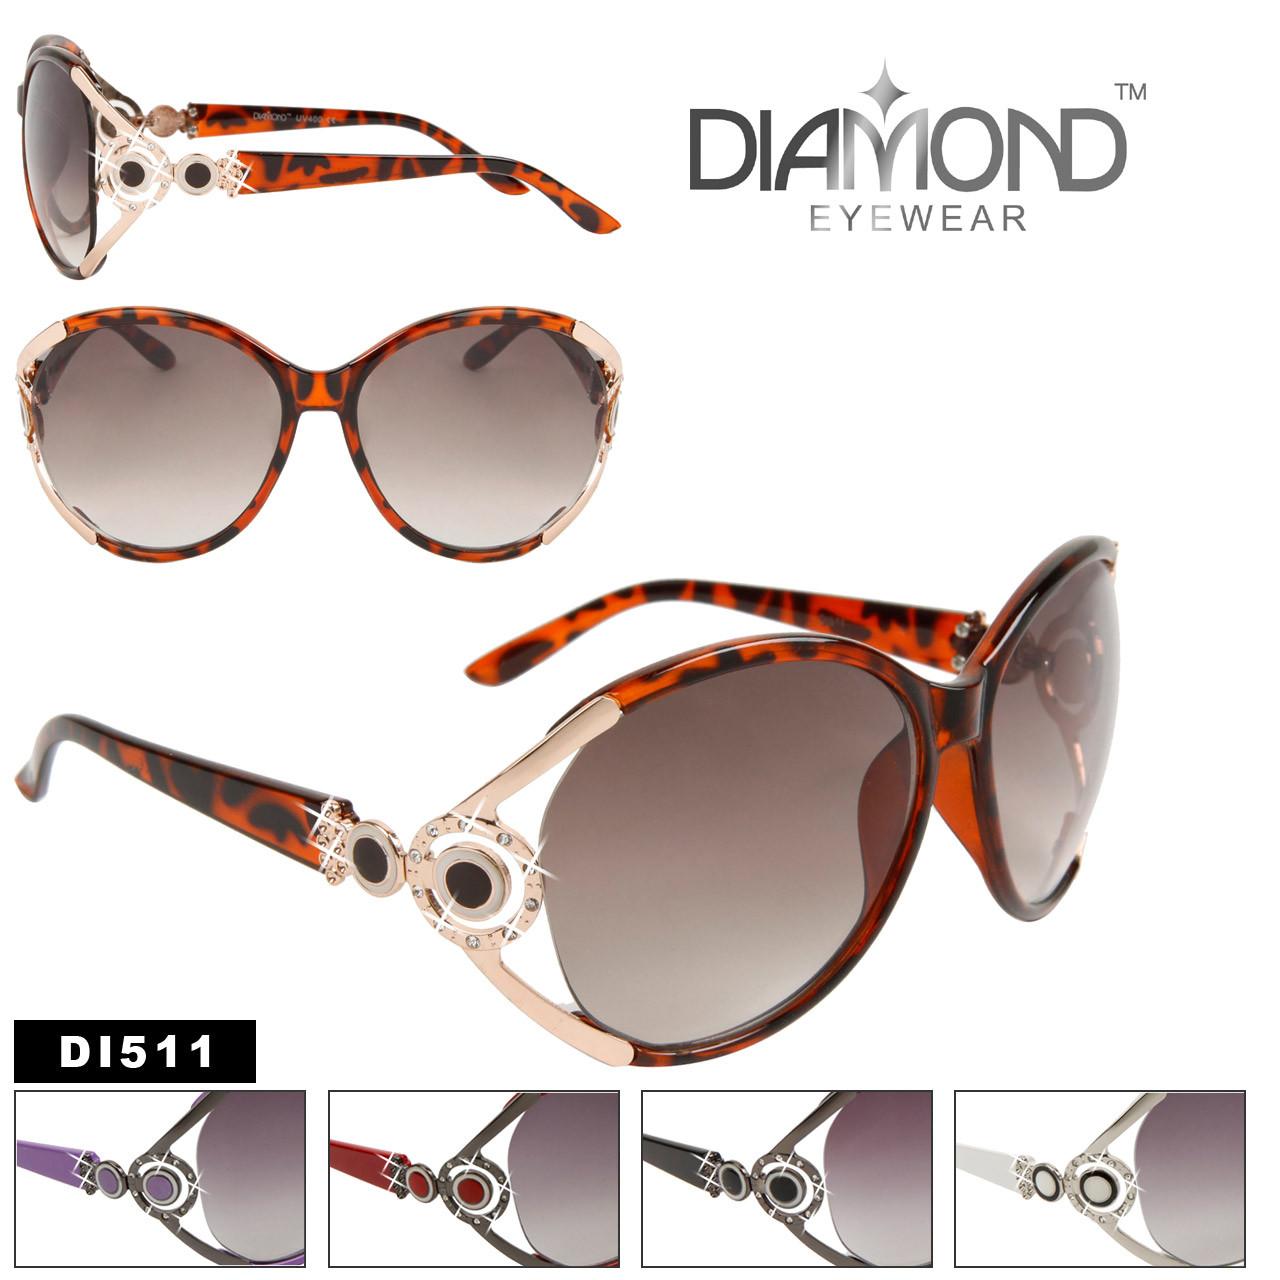 Attractive Diamond Eyewear Sunglasses DI511